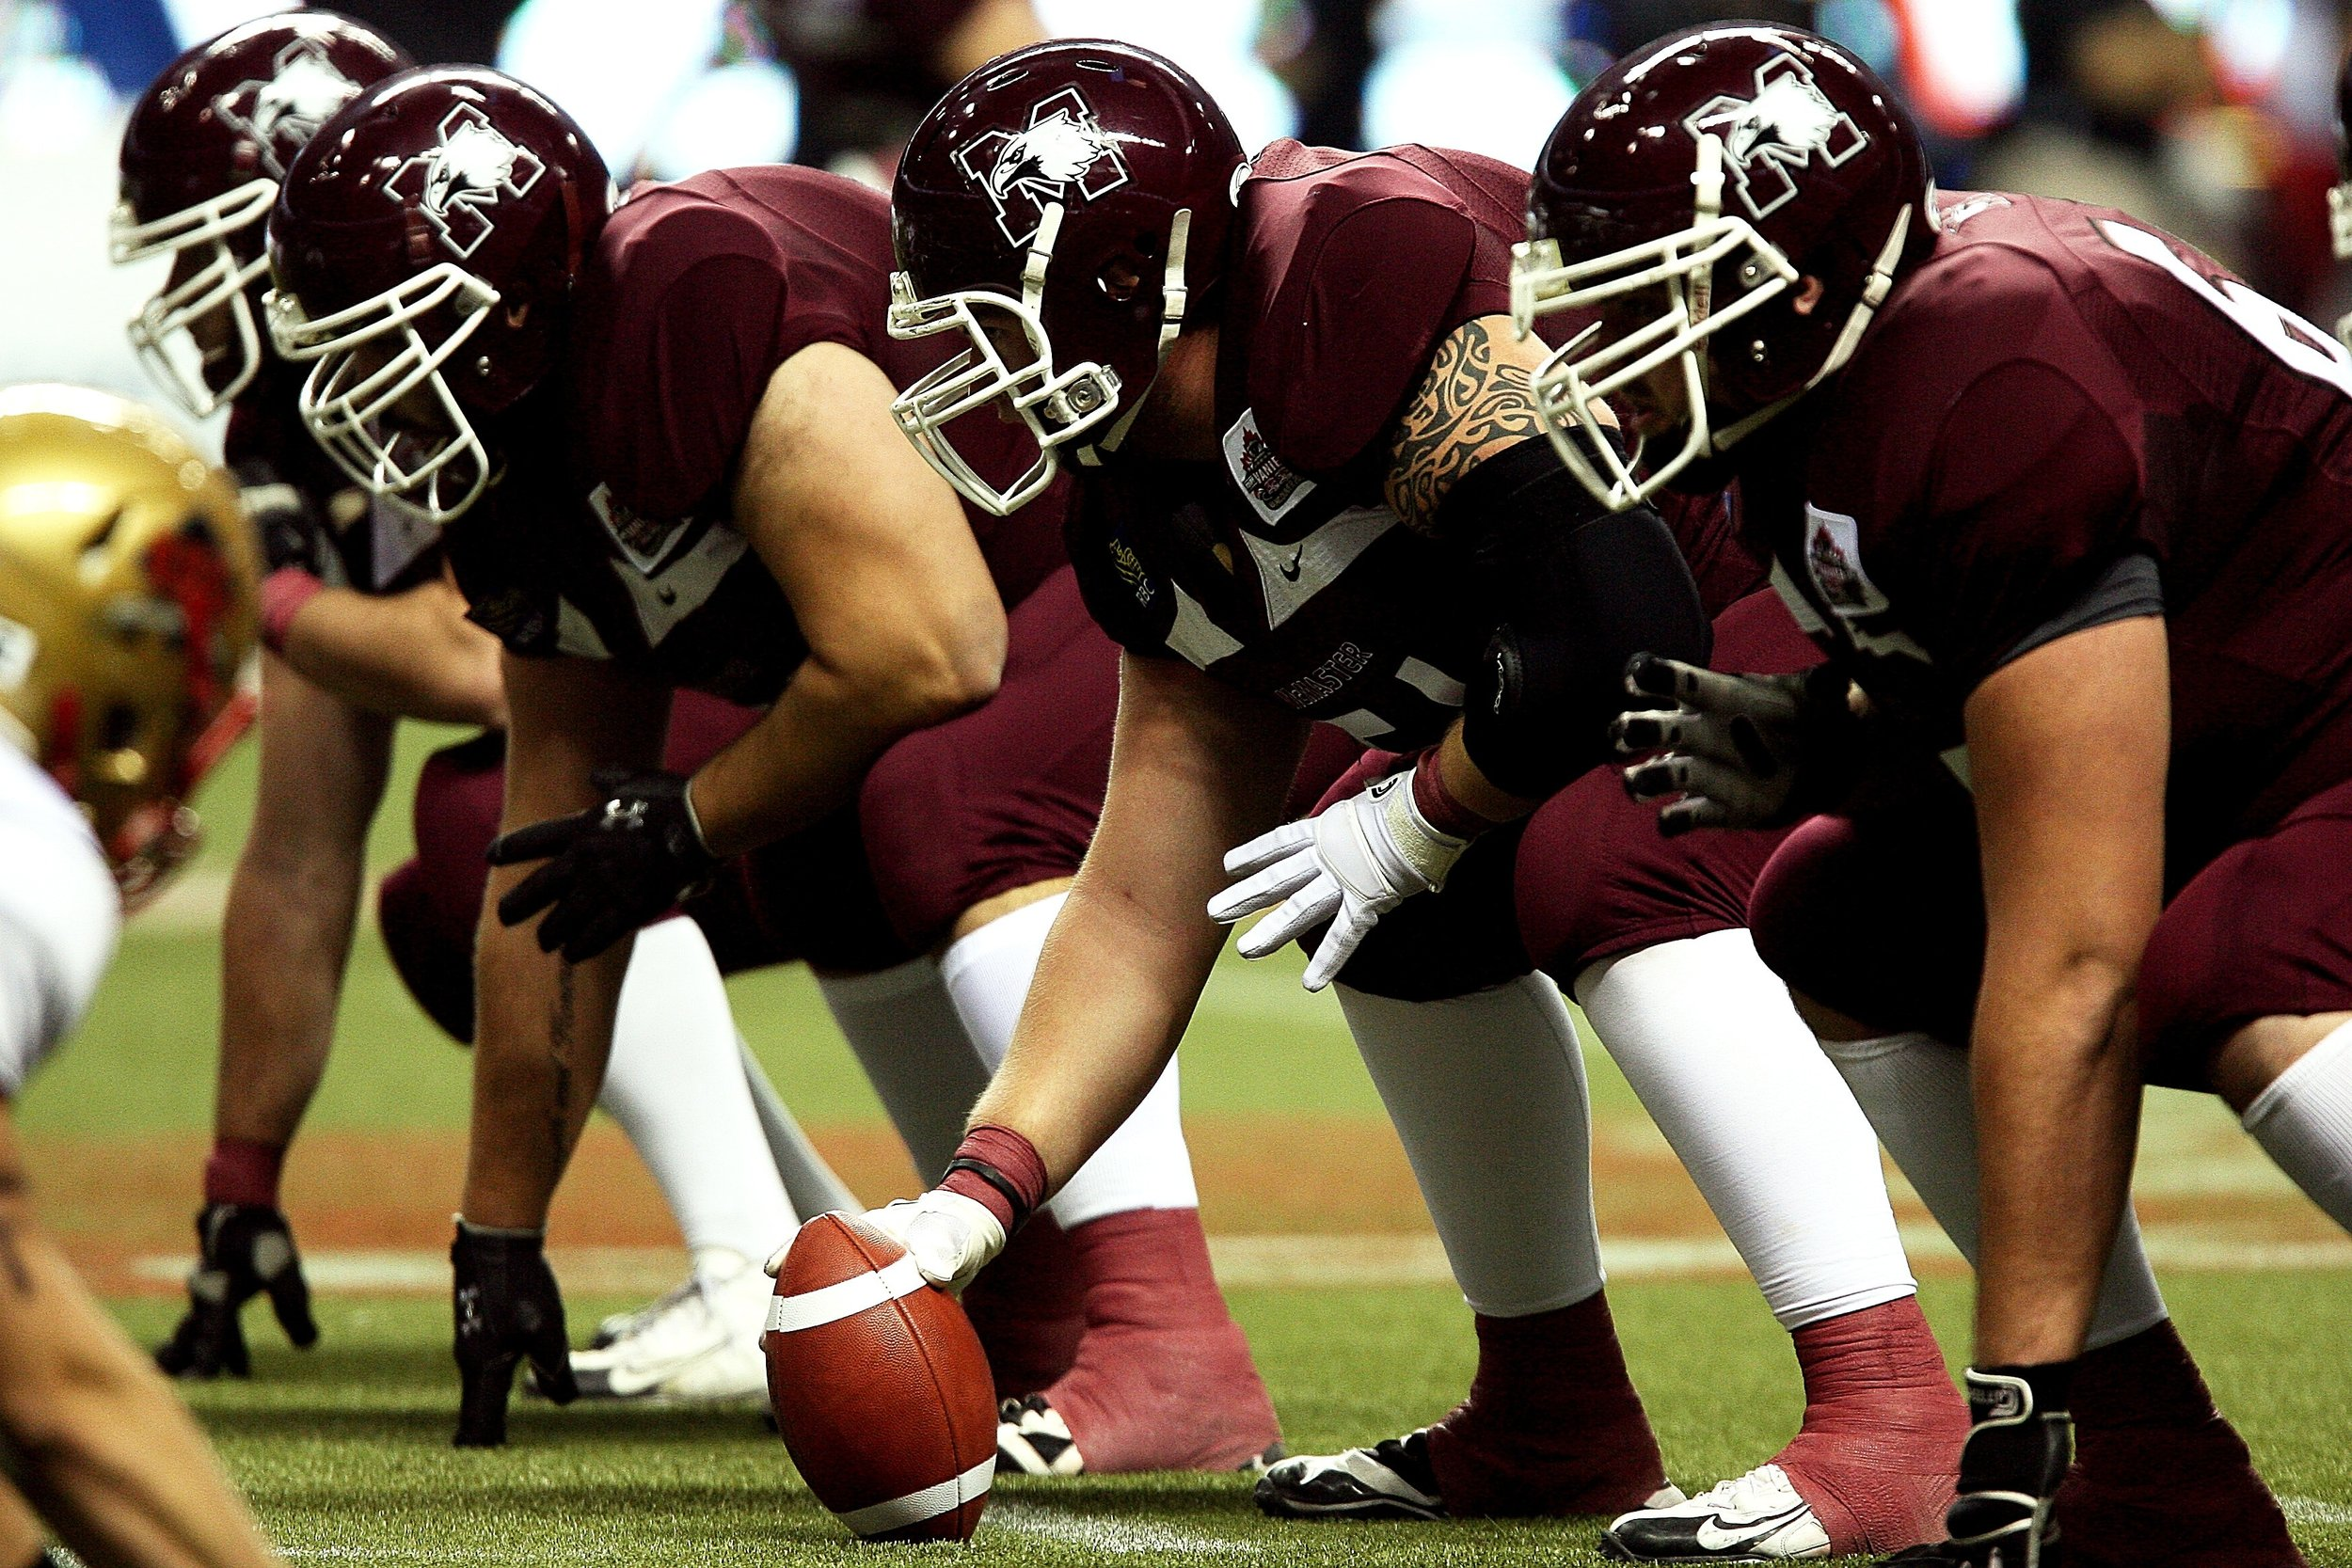 action-american-football-athletes-163398.jpg